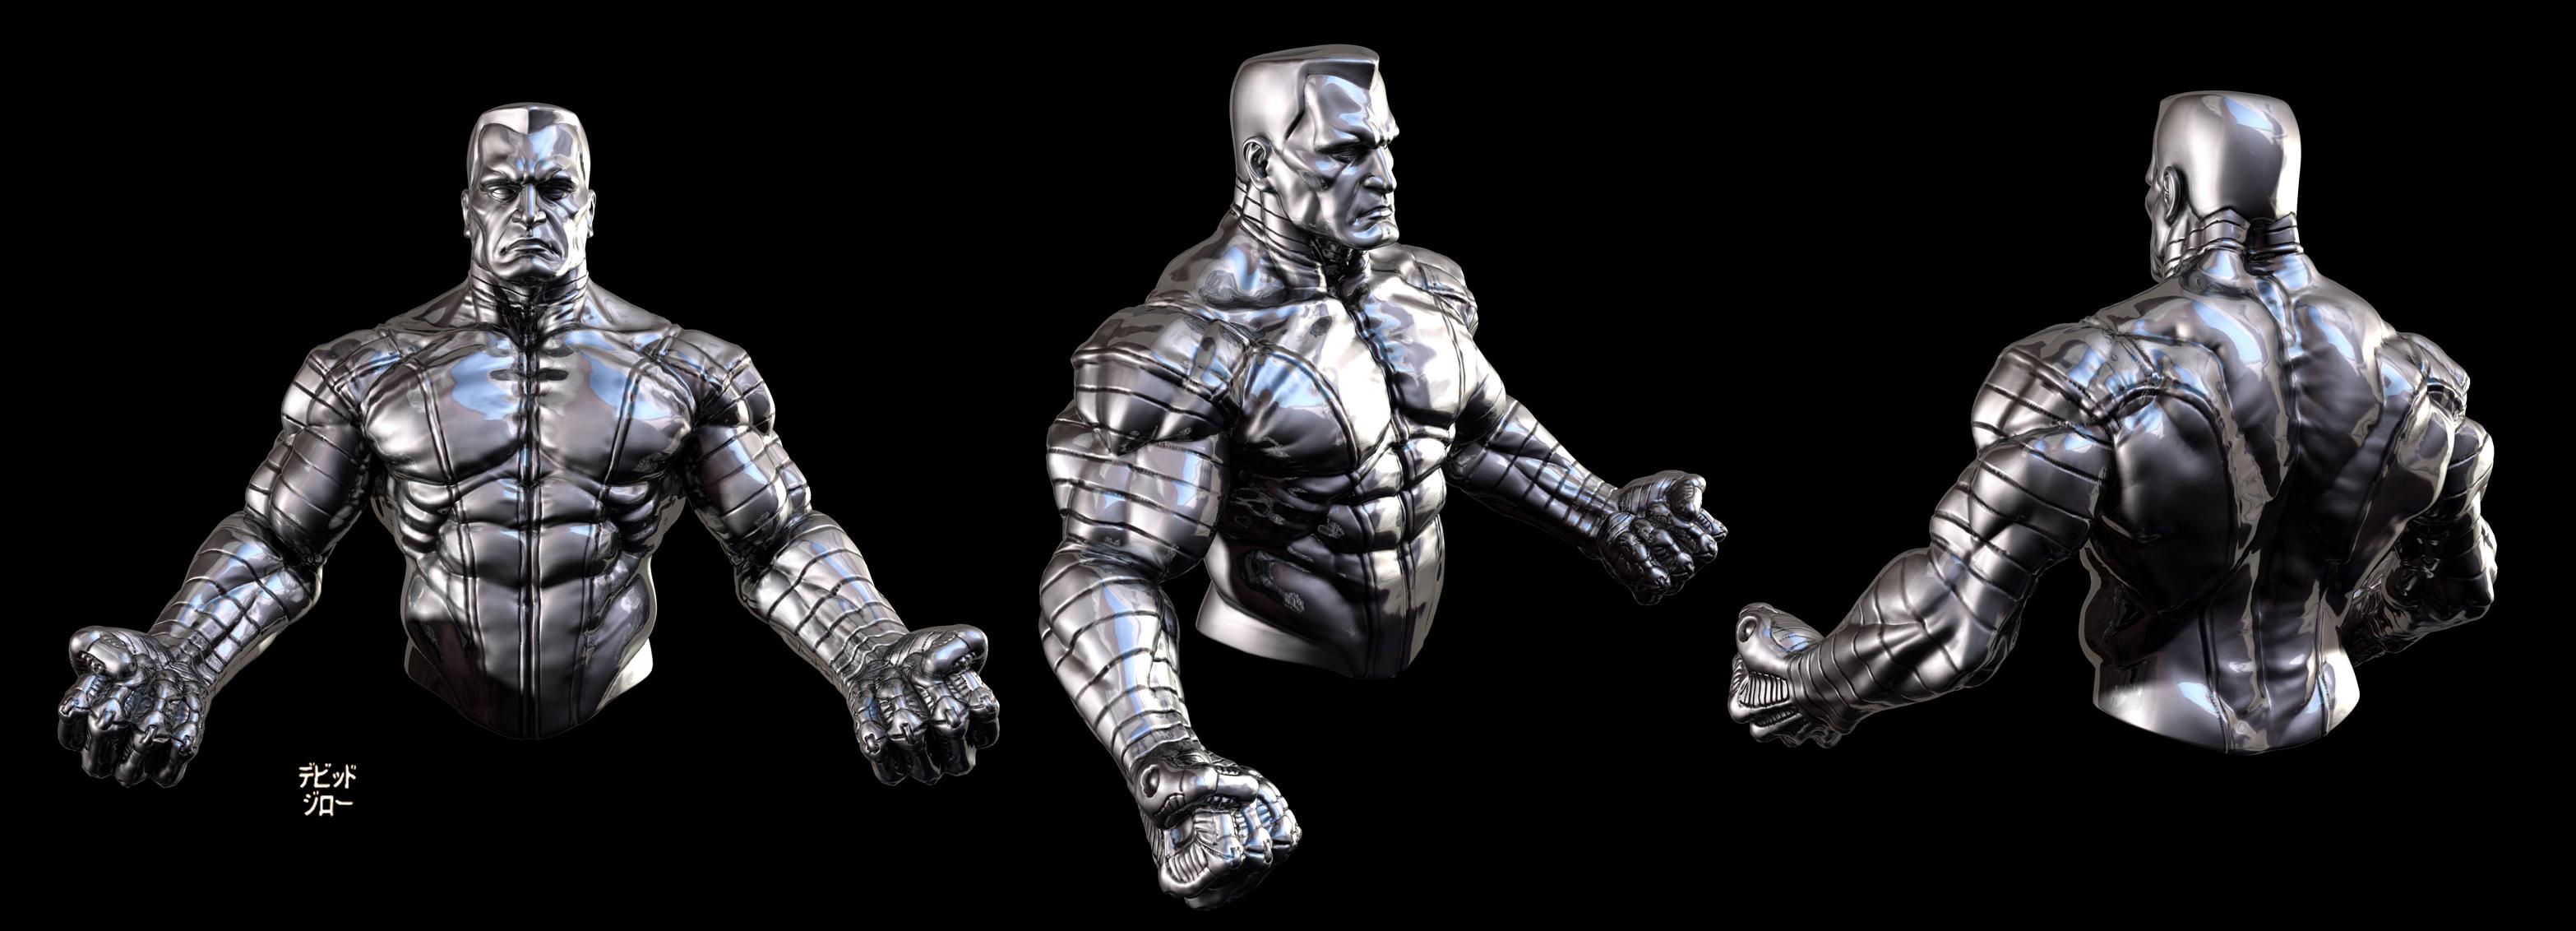 Download Wallpaper Marvel Juggernaut - j9UKol  Trends_31770.jpg